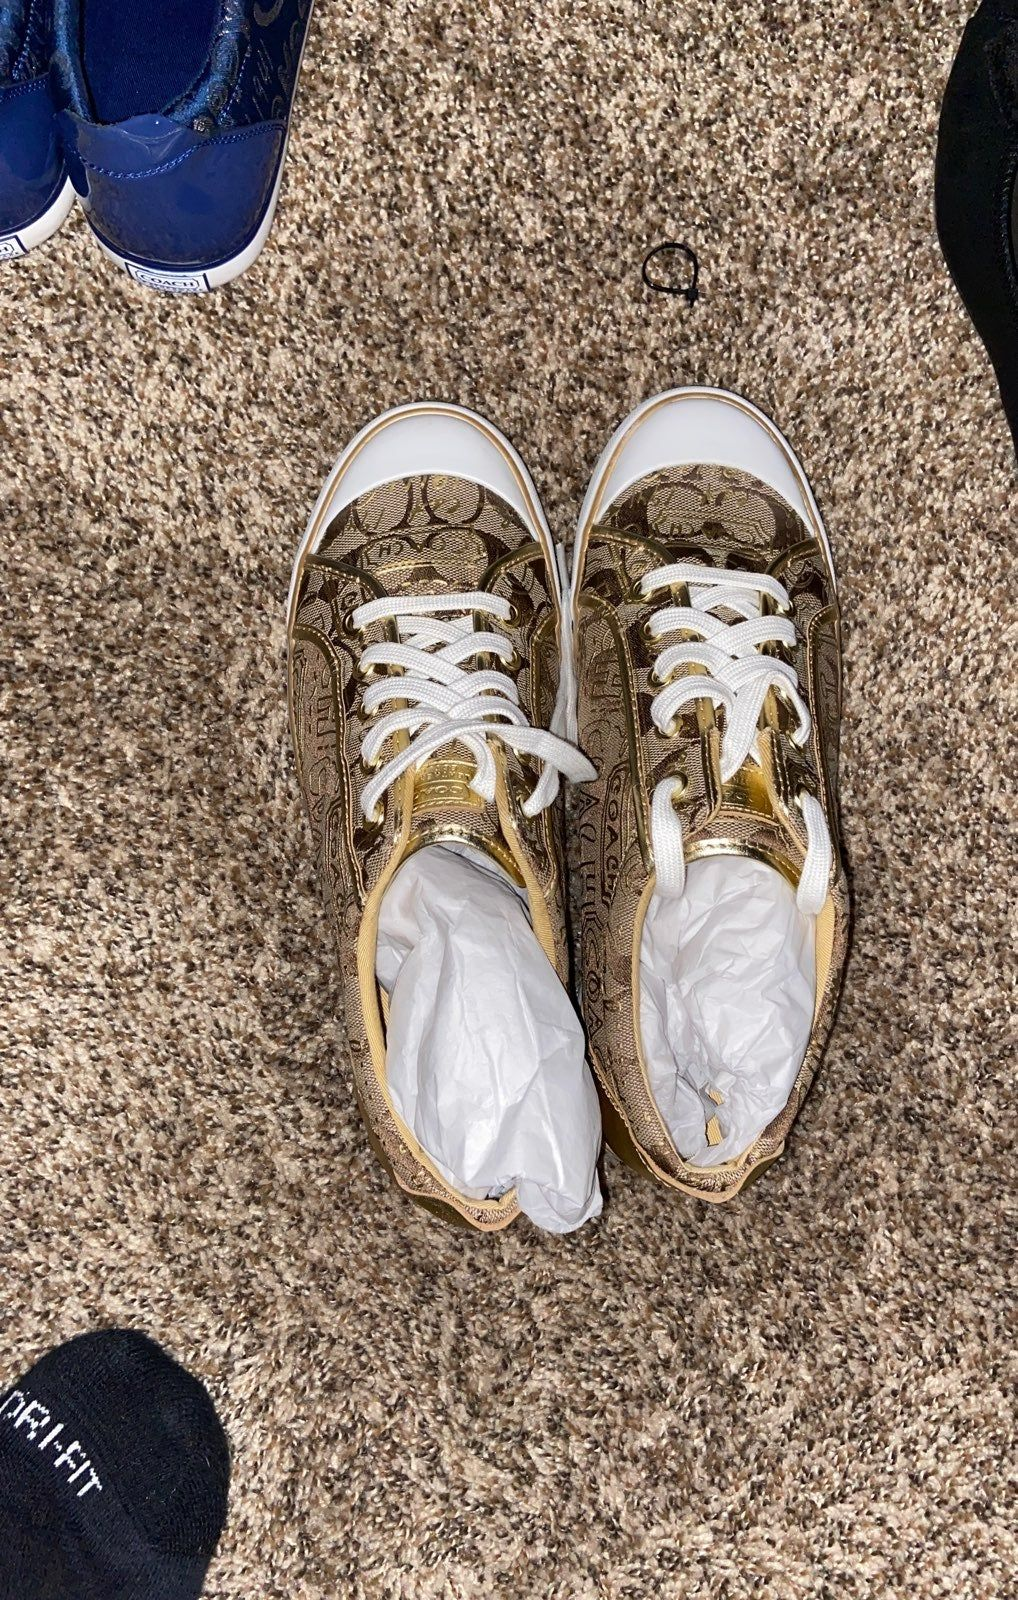 Coach tennis shoes, Coach fashion